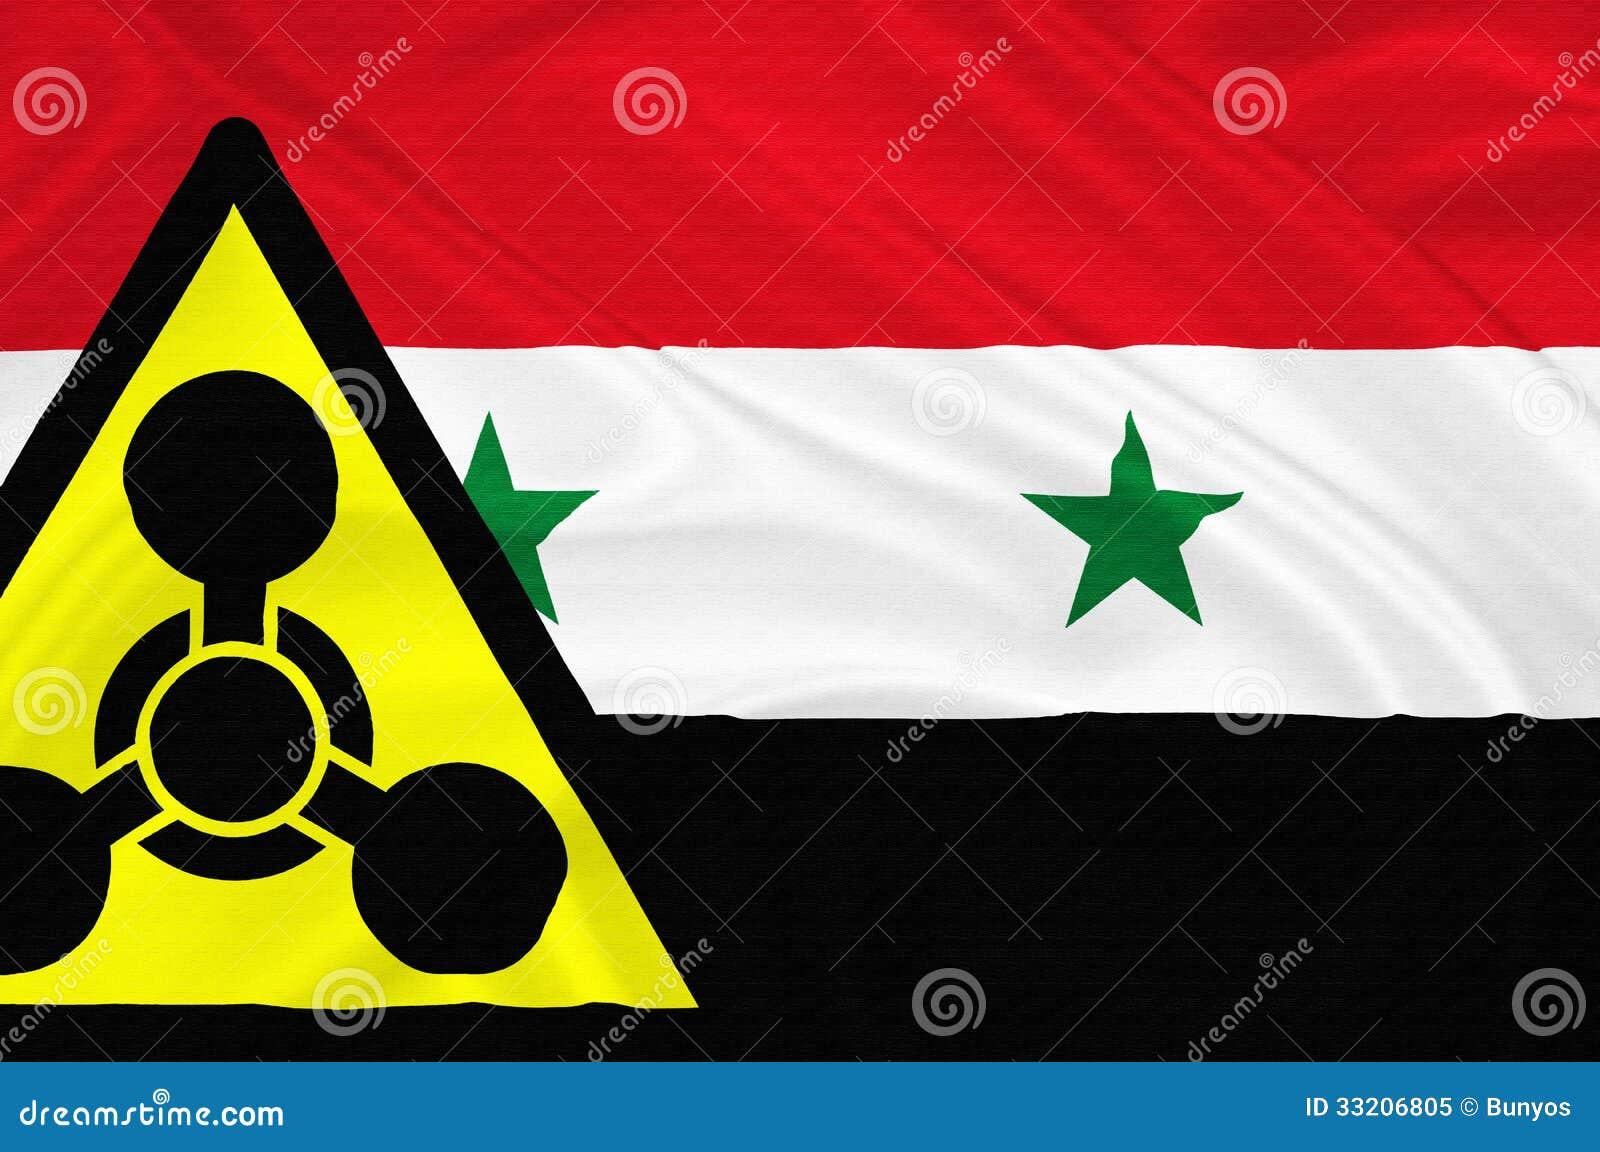 Syria crisis stock illustration. Illustration of danger ...